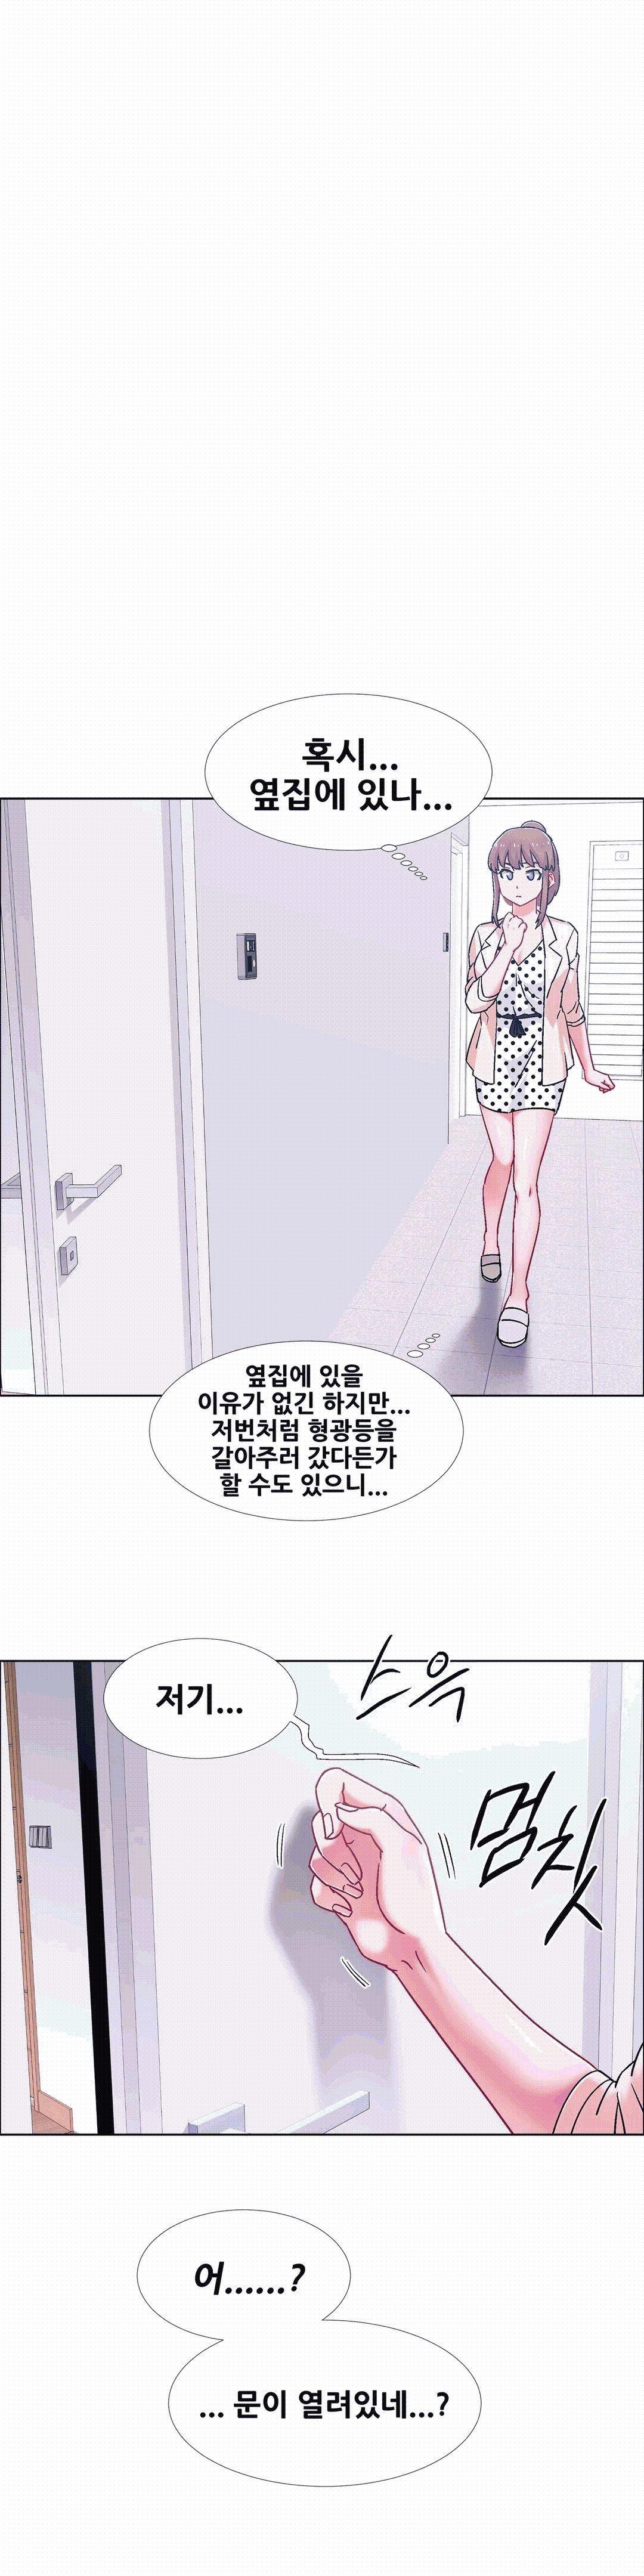 [Studio Wannabe] Rental Girls | 出租女郎 Ch. 33-58 [Chinese]  第二季 完结 643